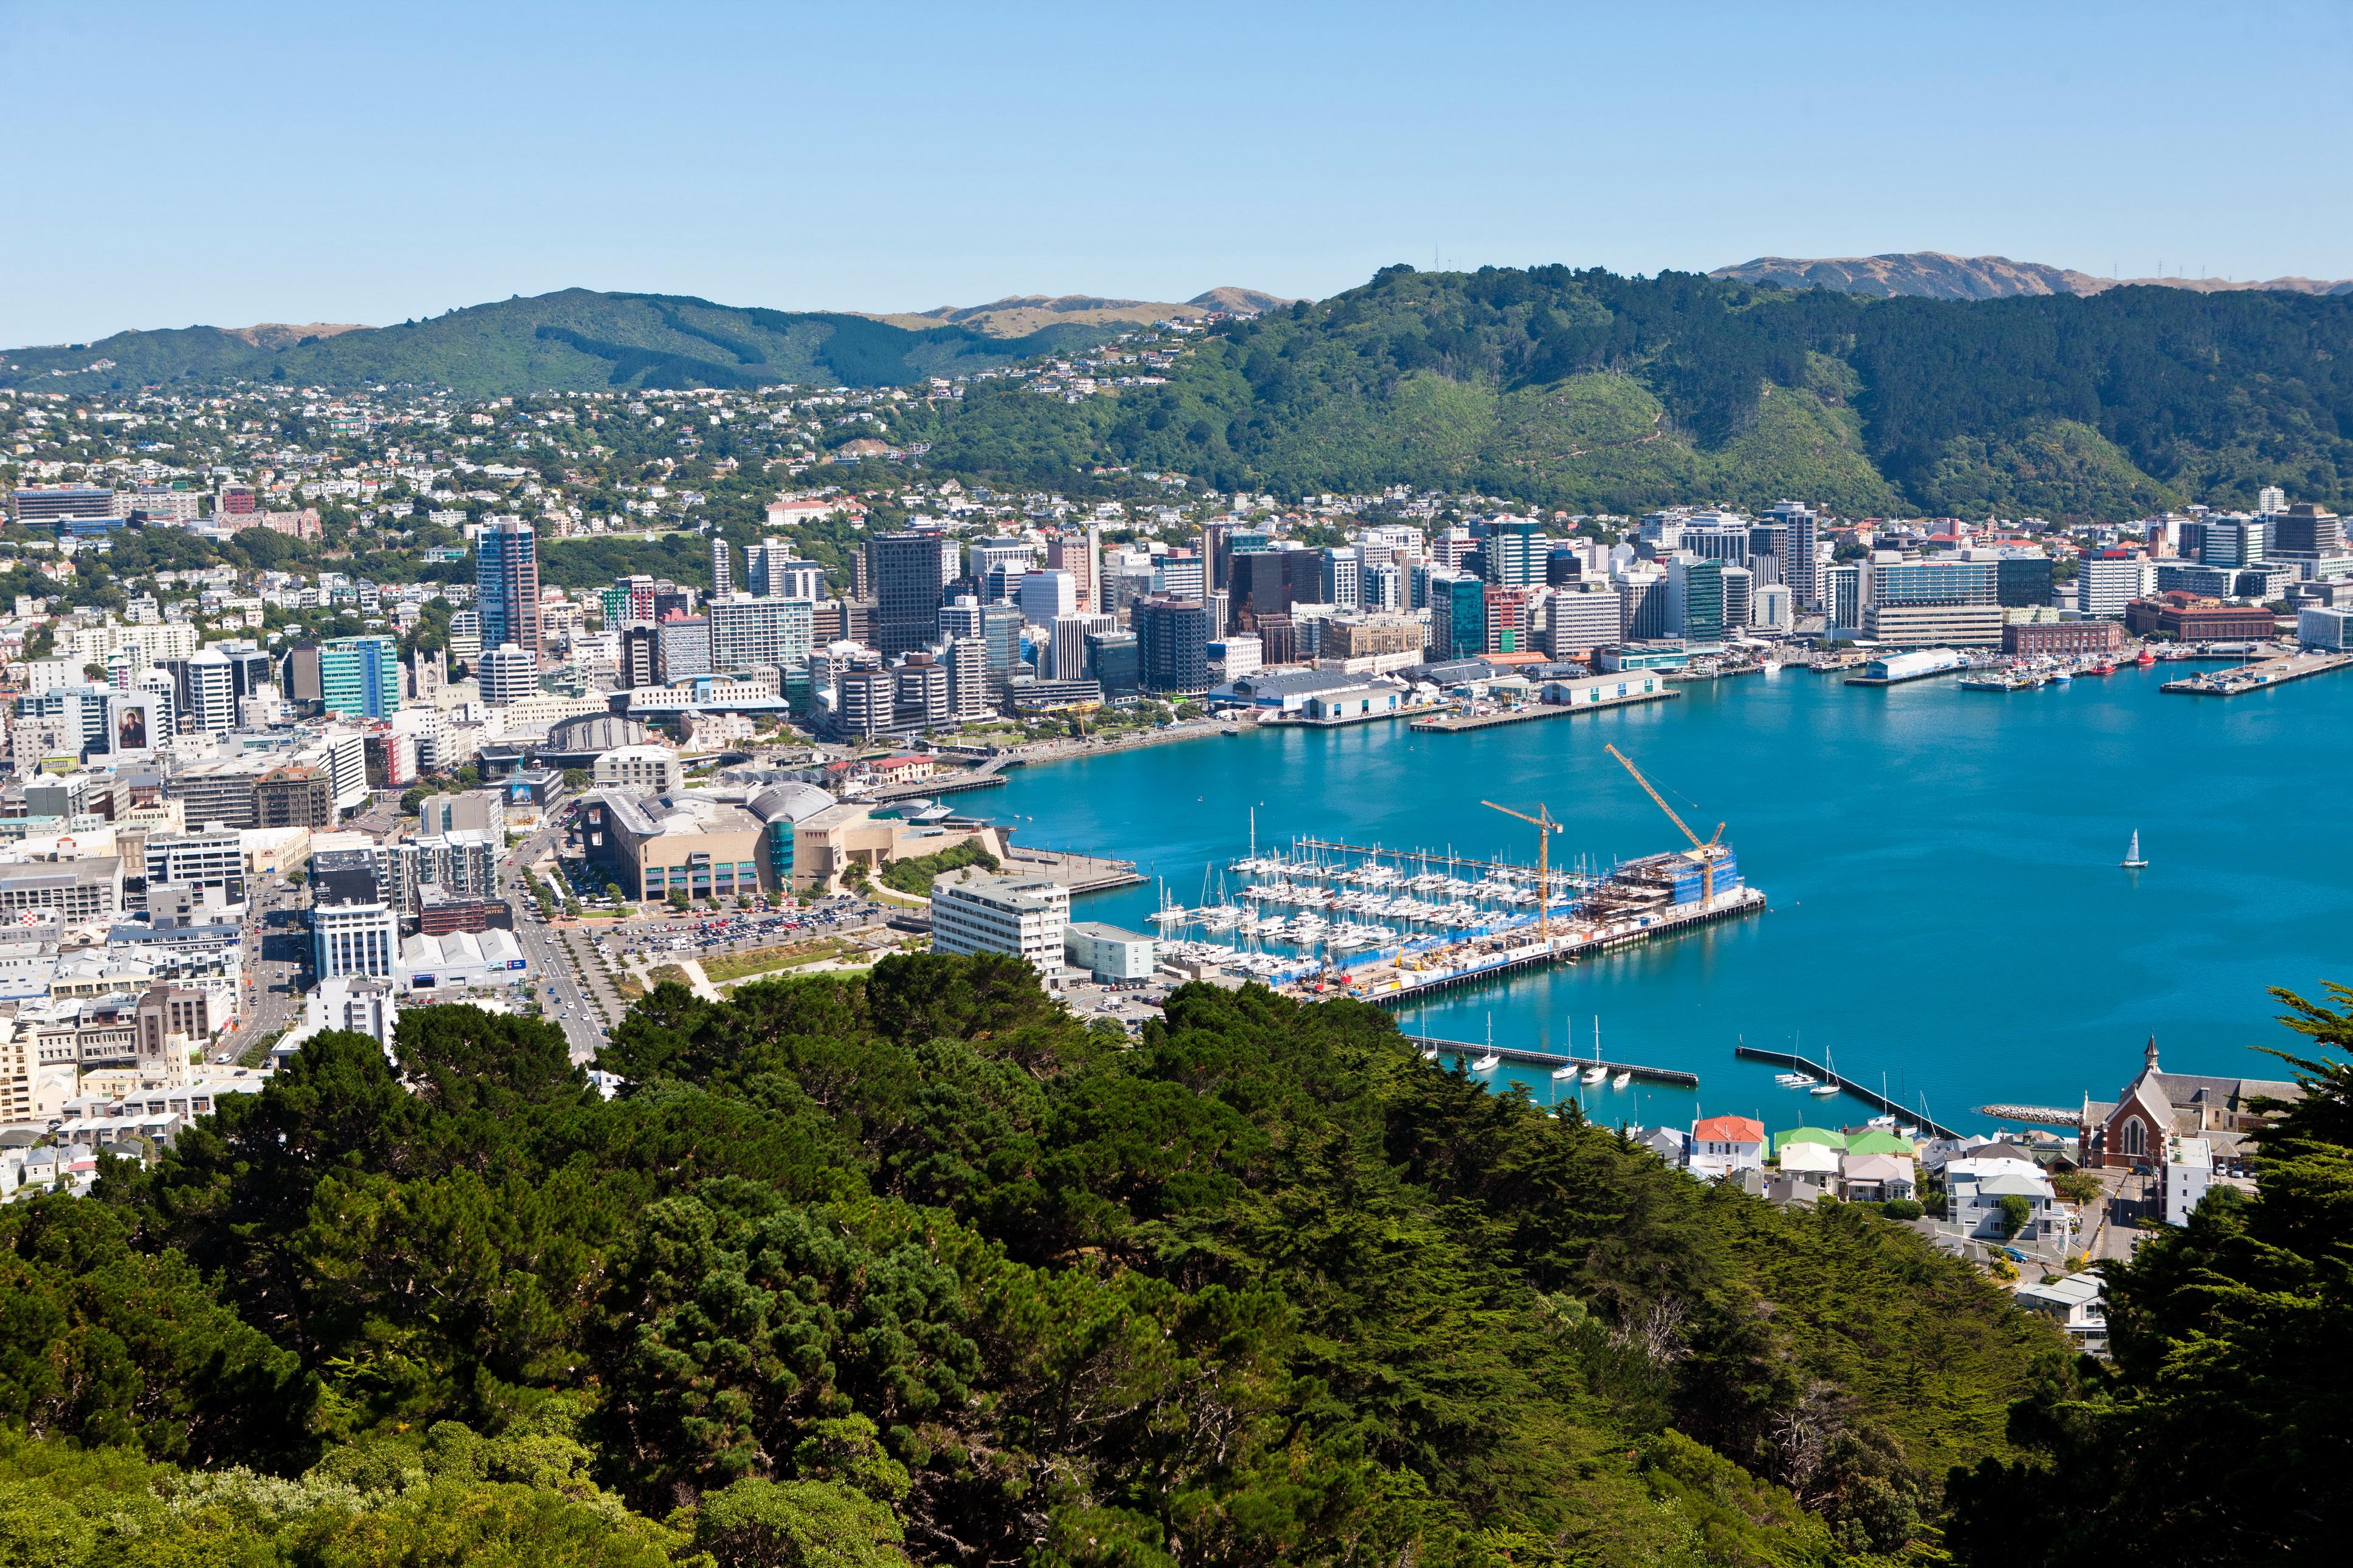 New Zealand Coast Marinas Wellington From above Cities wallpaper 3872x2581